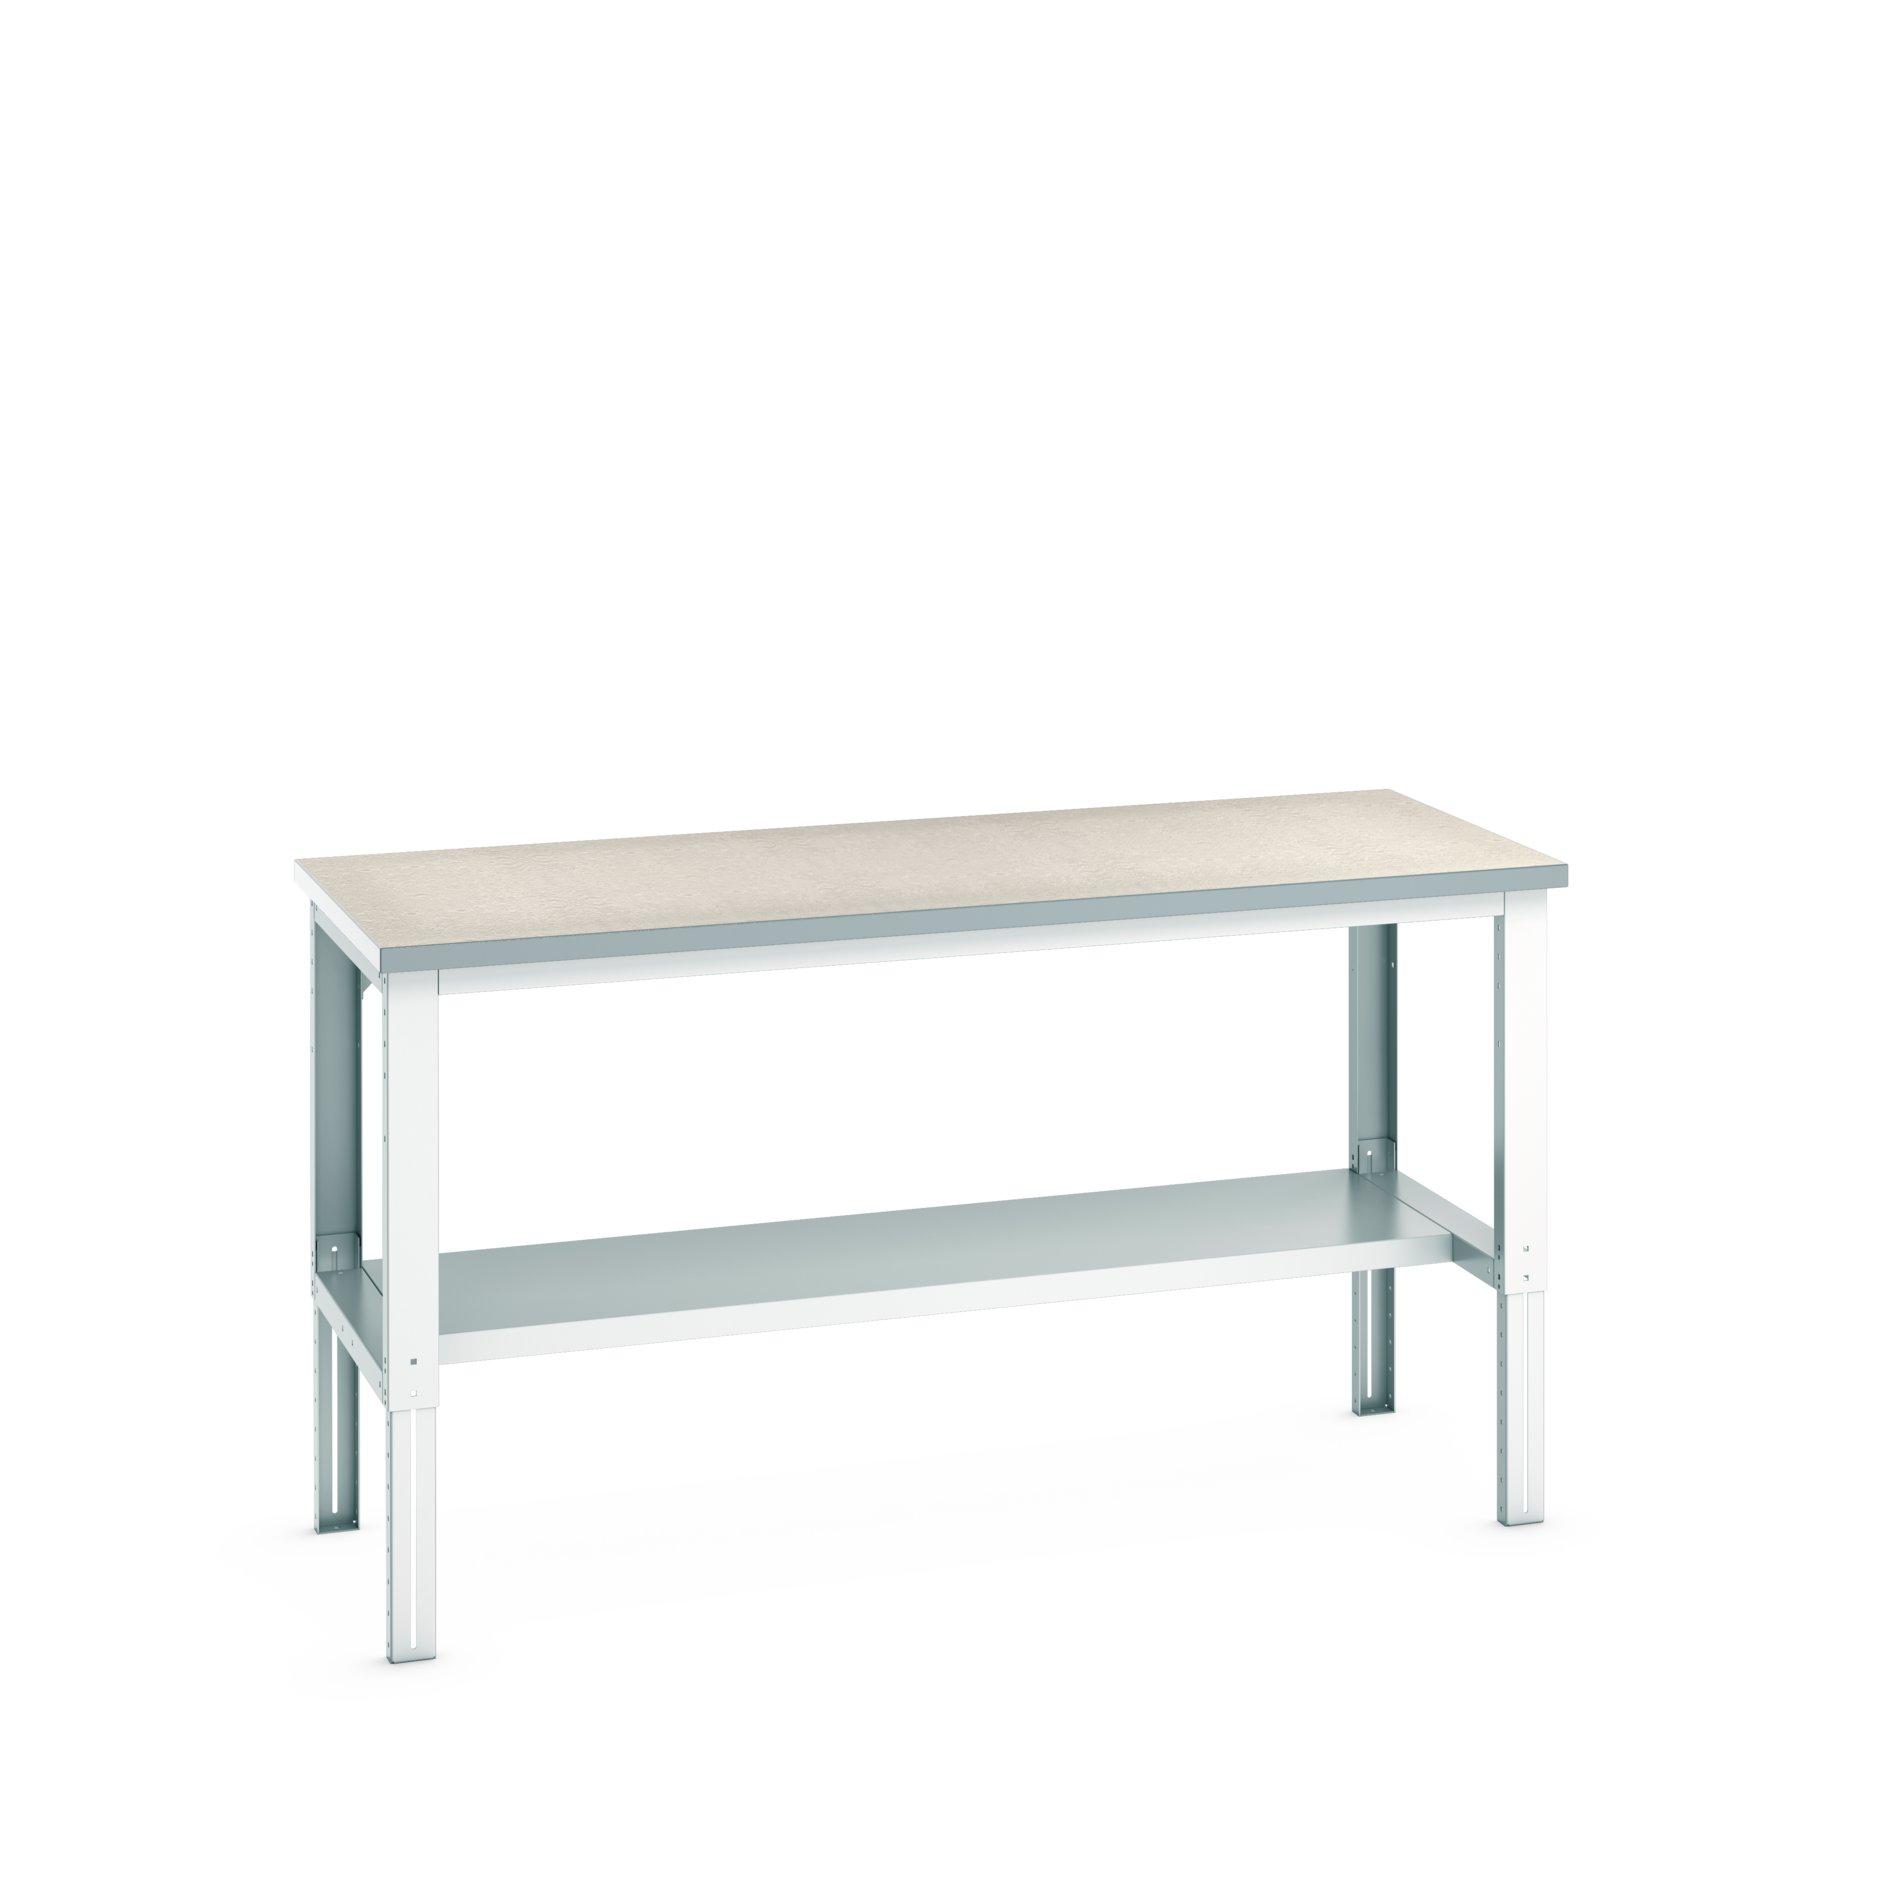 Bott Cubio Adjustable Height Framework Bench With Half Depth Base Shelf